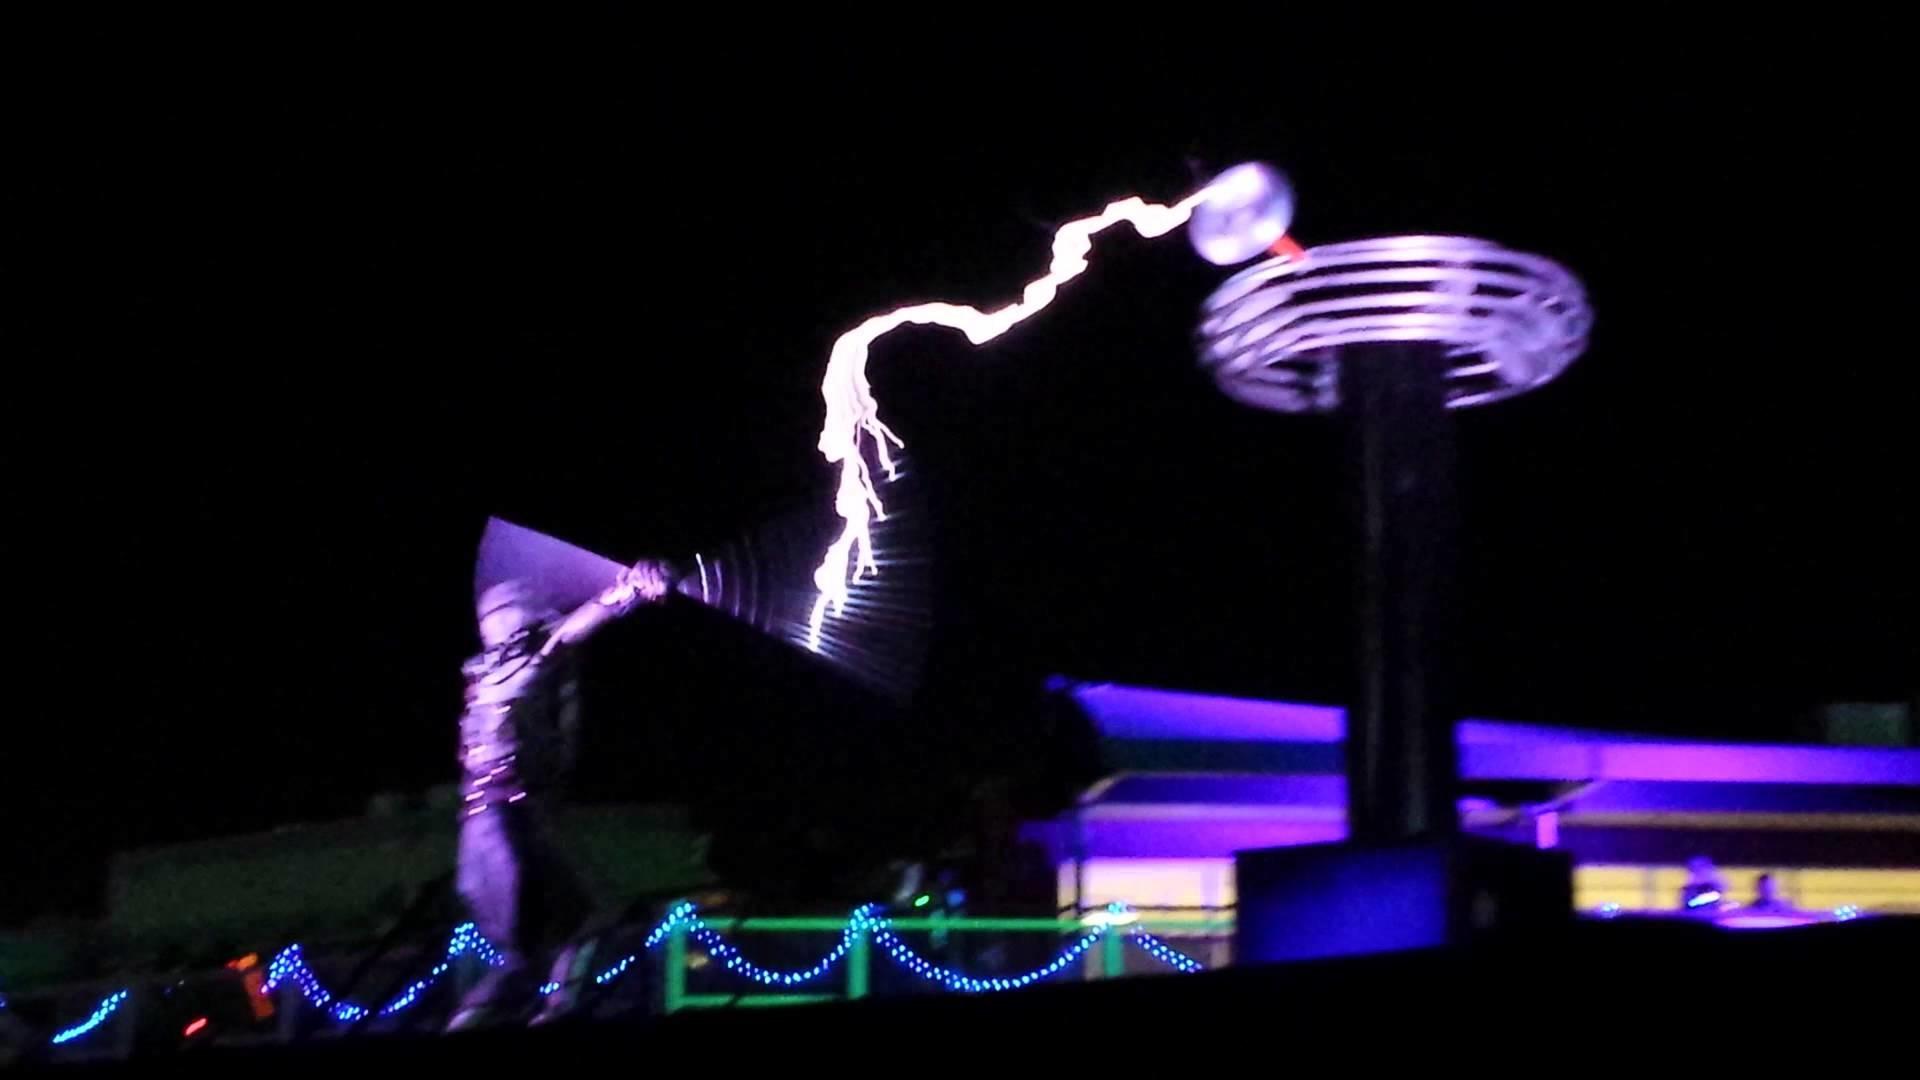 Tesla Coil Electricity Dance @ EDC Las Vegas 2015